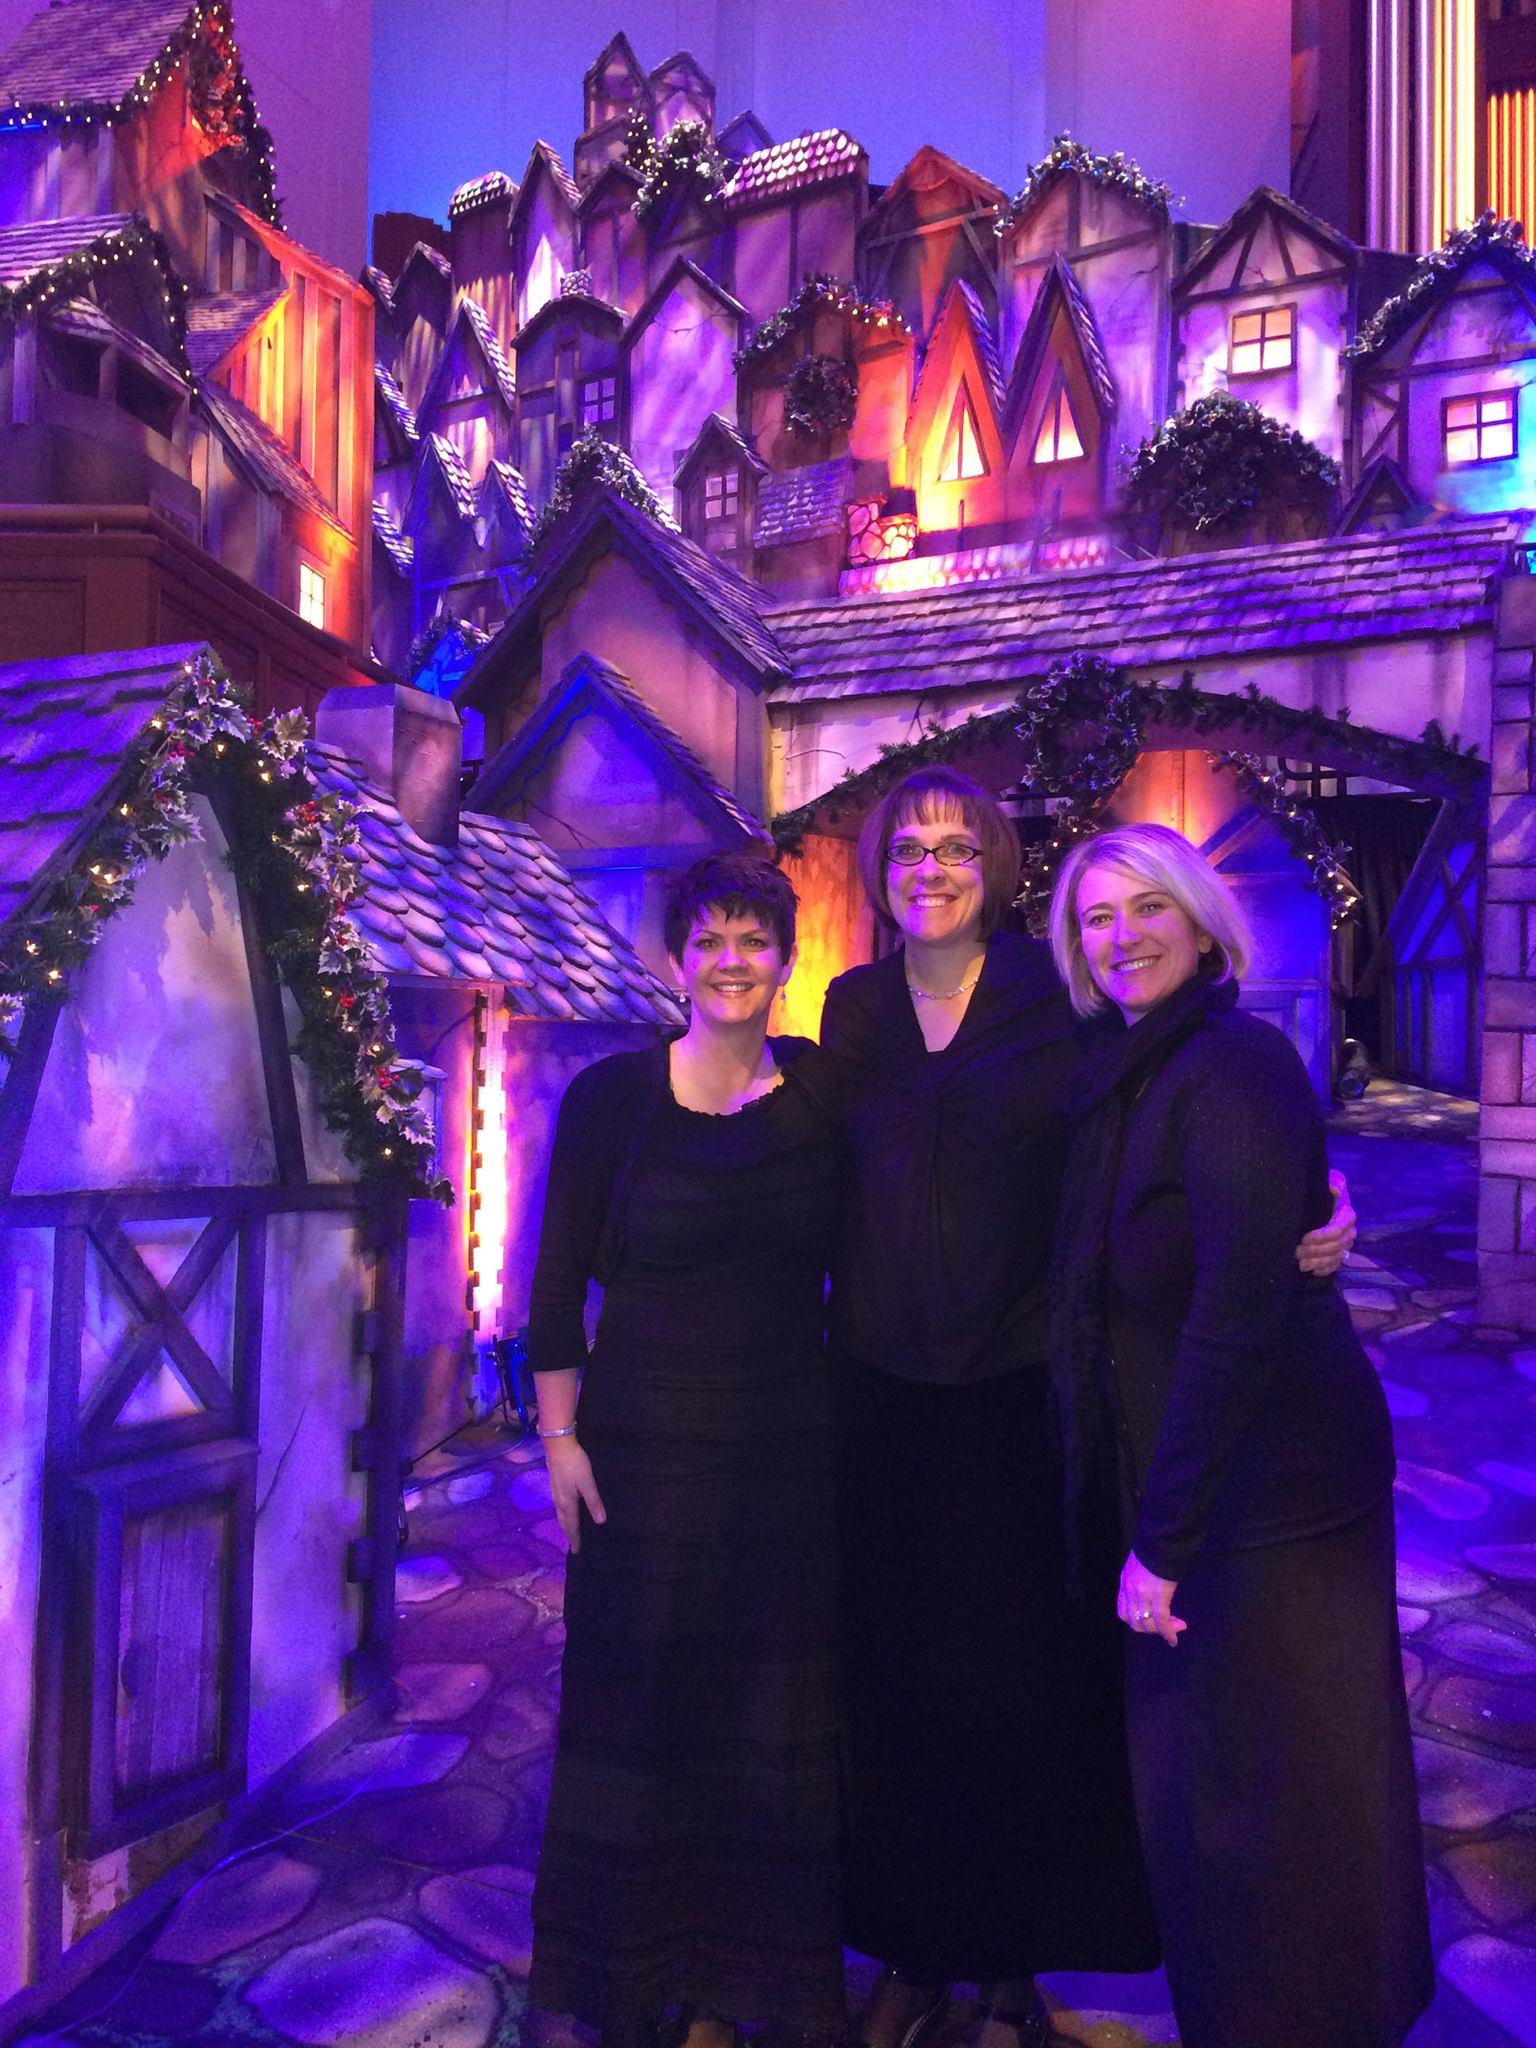 Mormon Tabernacle Christmas Concert - Jeannine Goeckeritz, Jen Rudd, Tiffany Sedgley.jpg